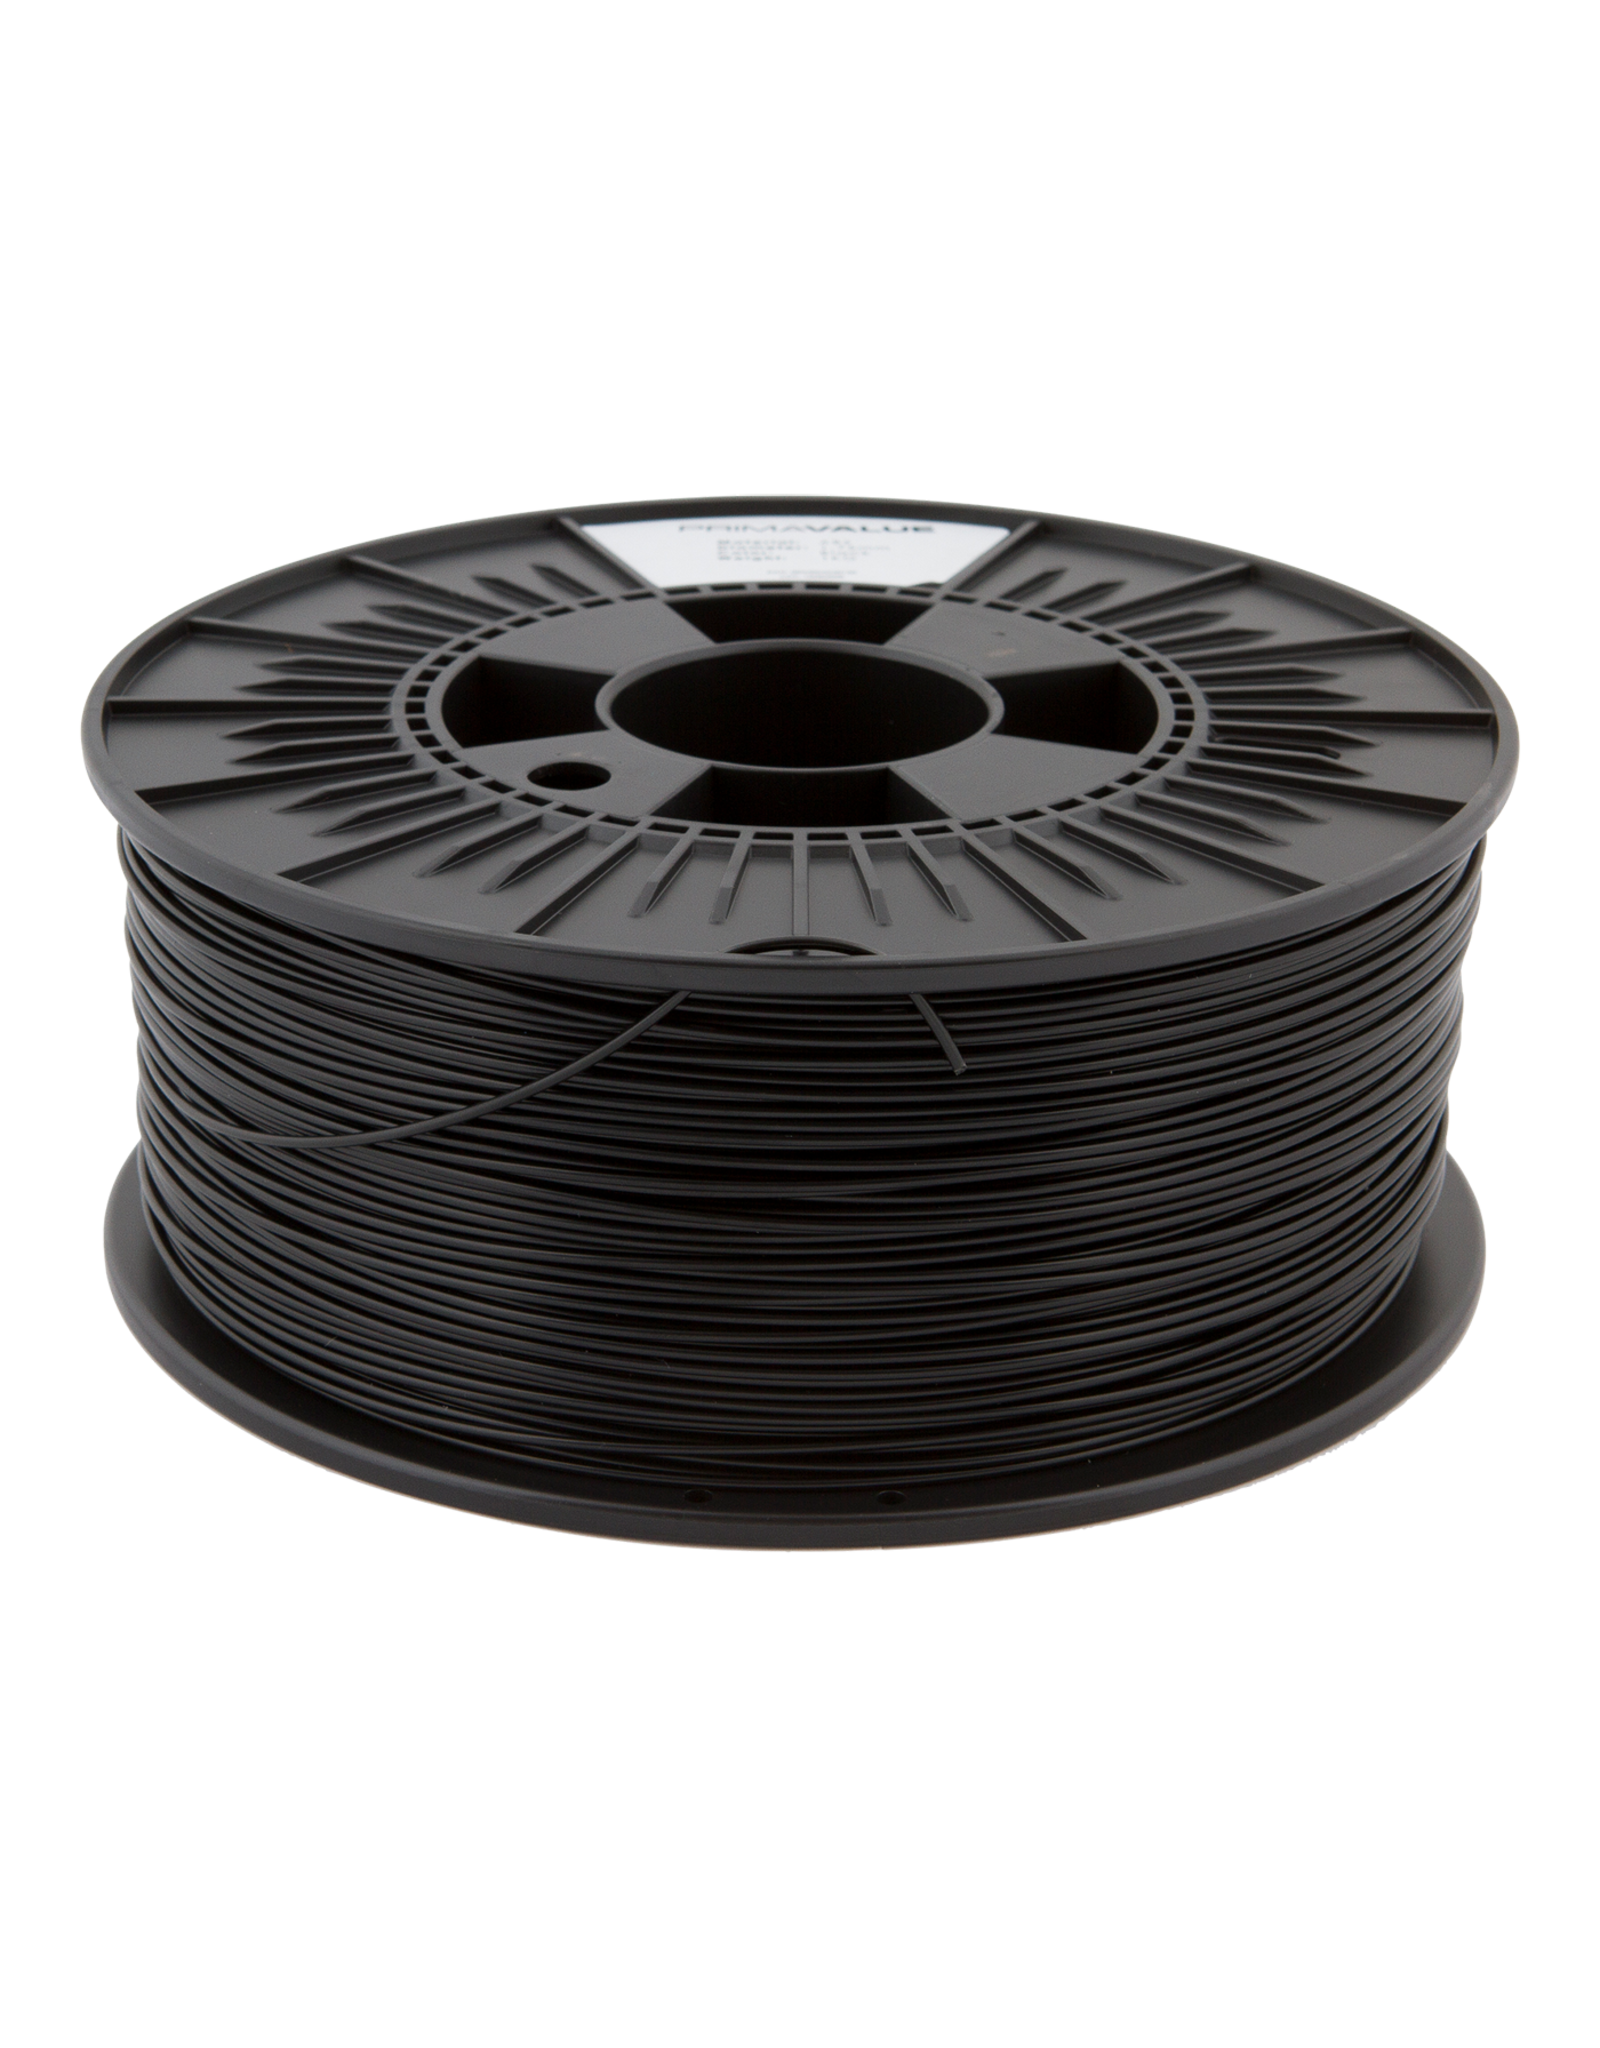 Prima PrimaValue ABS Filament - 1.75mm - 1 kg - Zwart